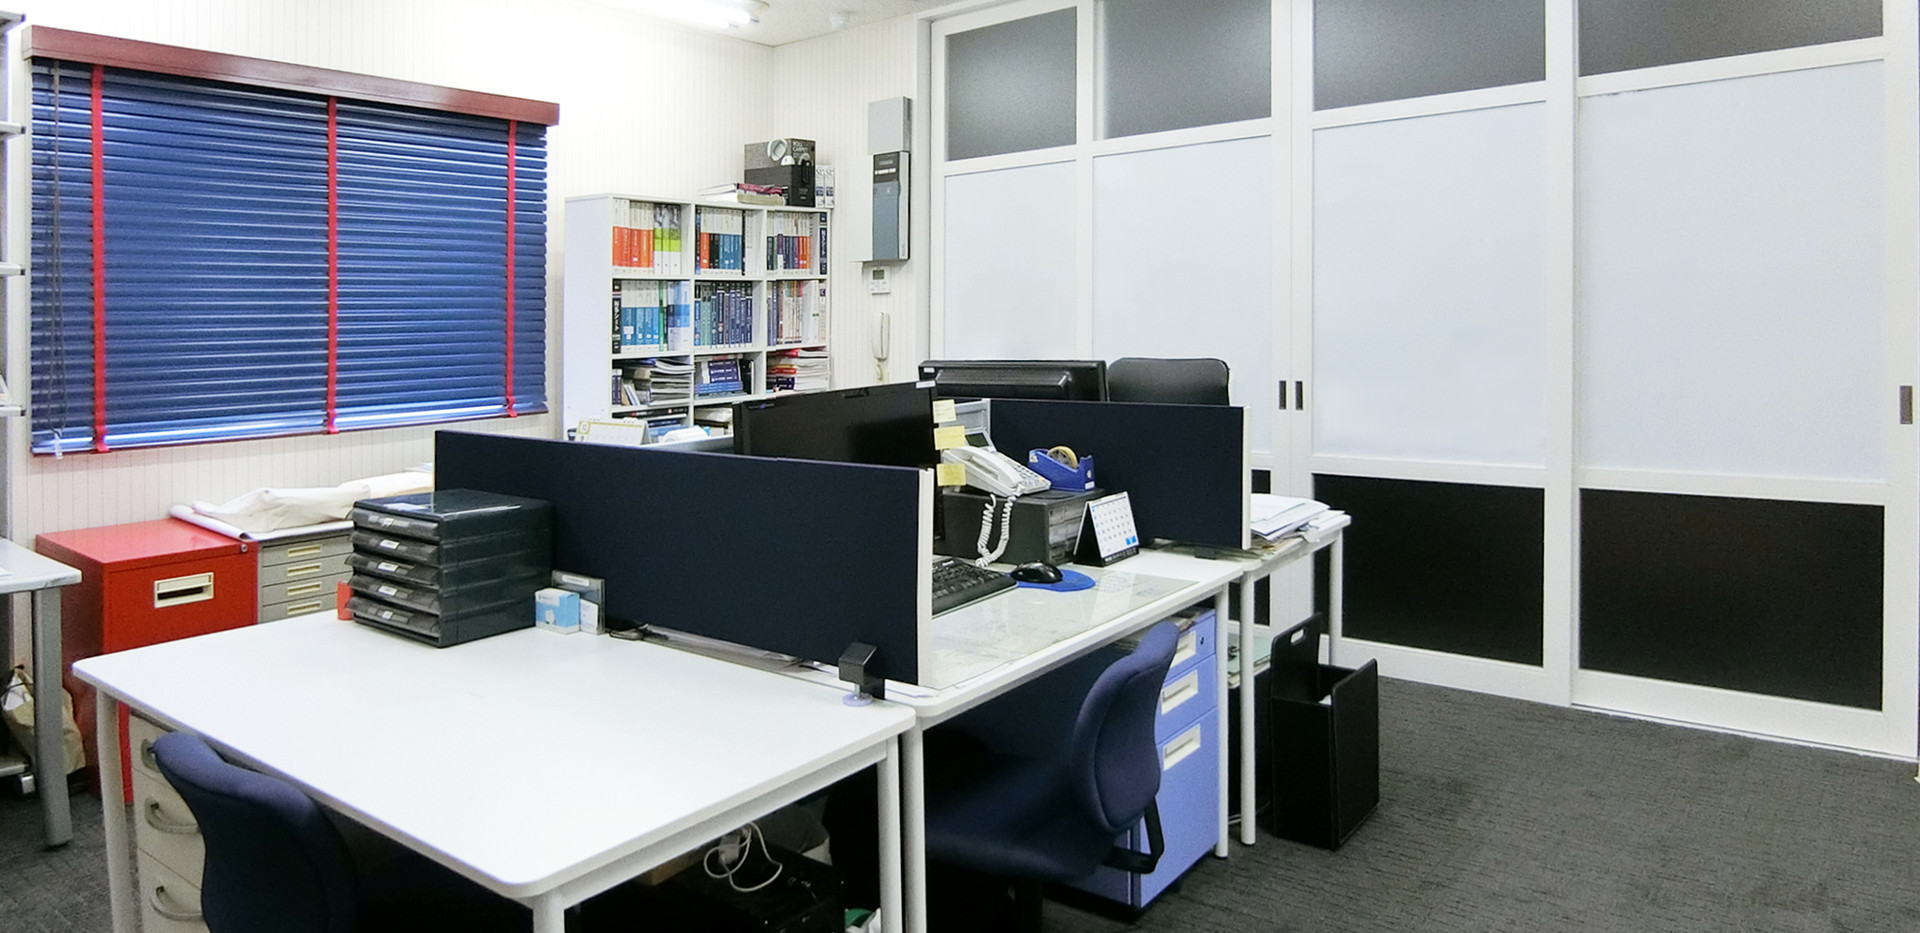 OFFICE(熊谷市)-2F事務所-A-01.jpg